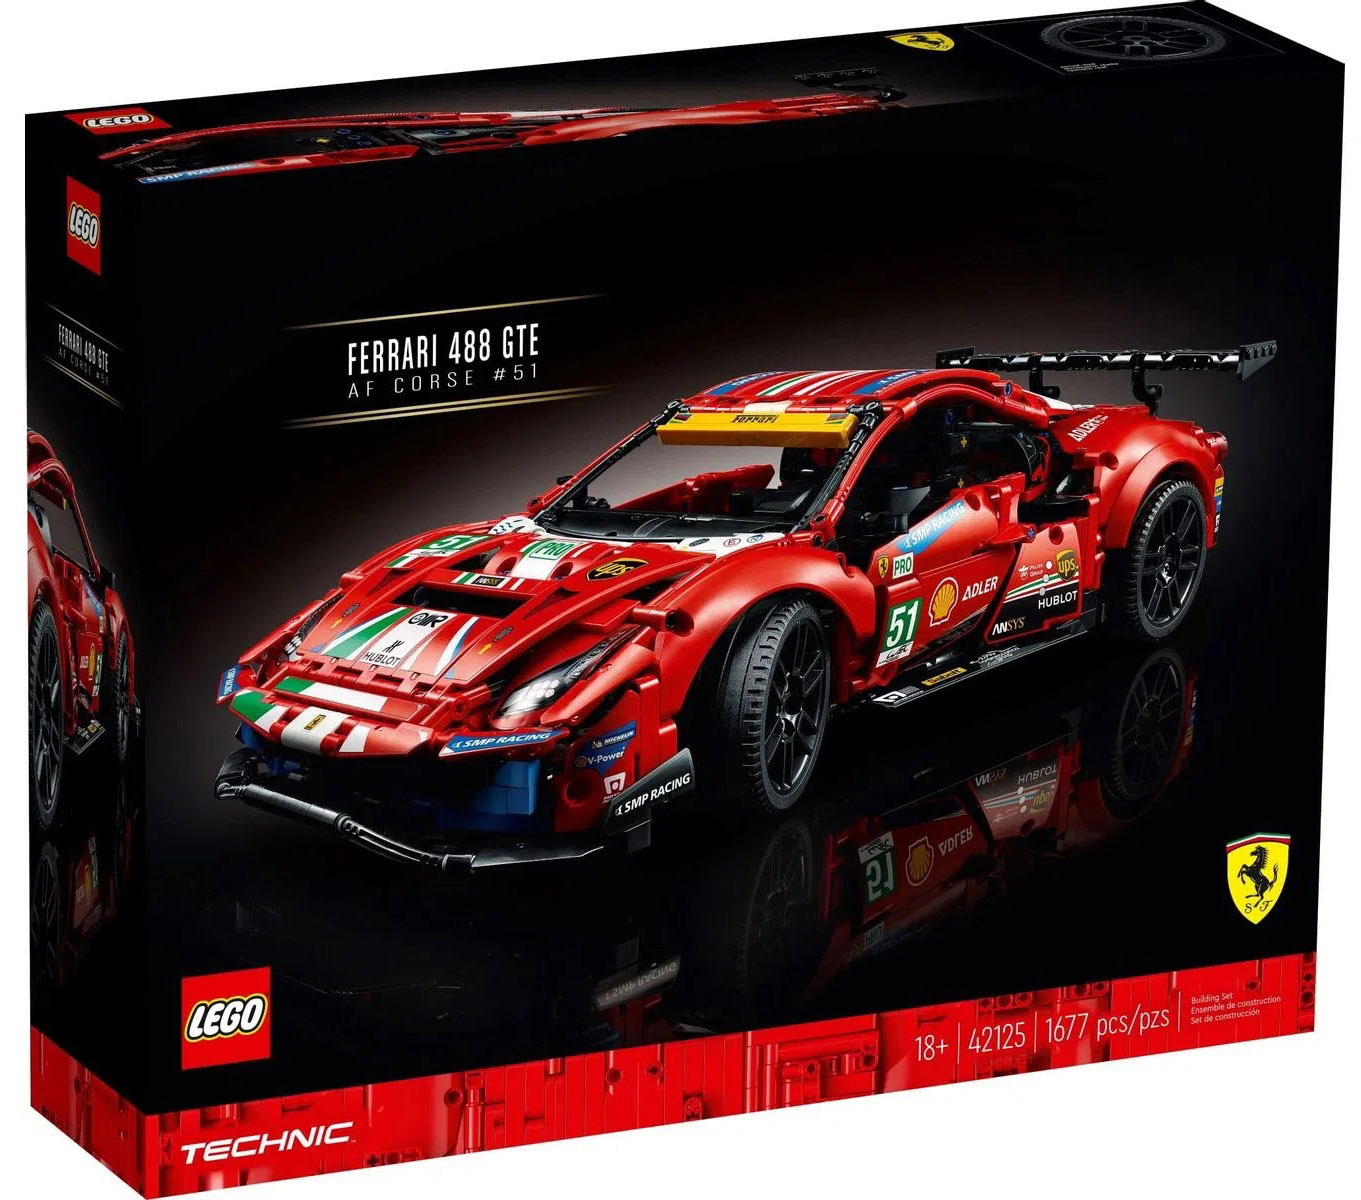 LEGO Technic Ferrari 488 GTE AF Corse #51 42125